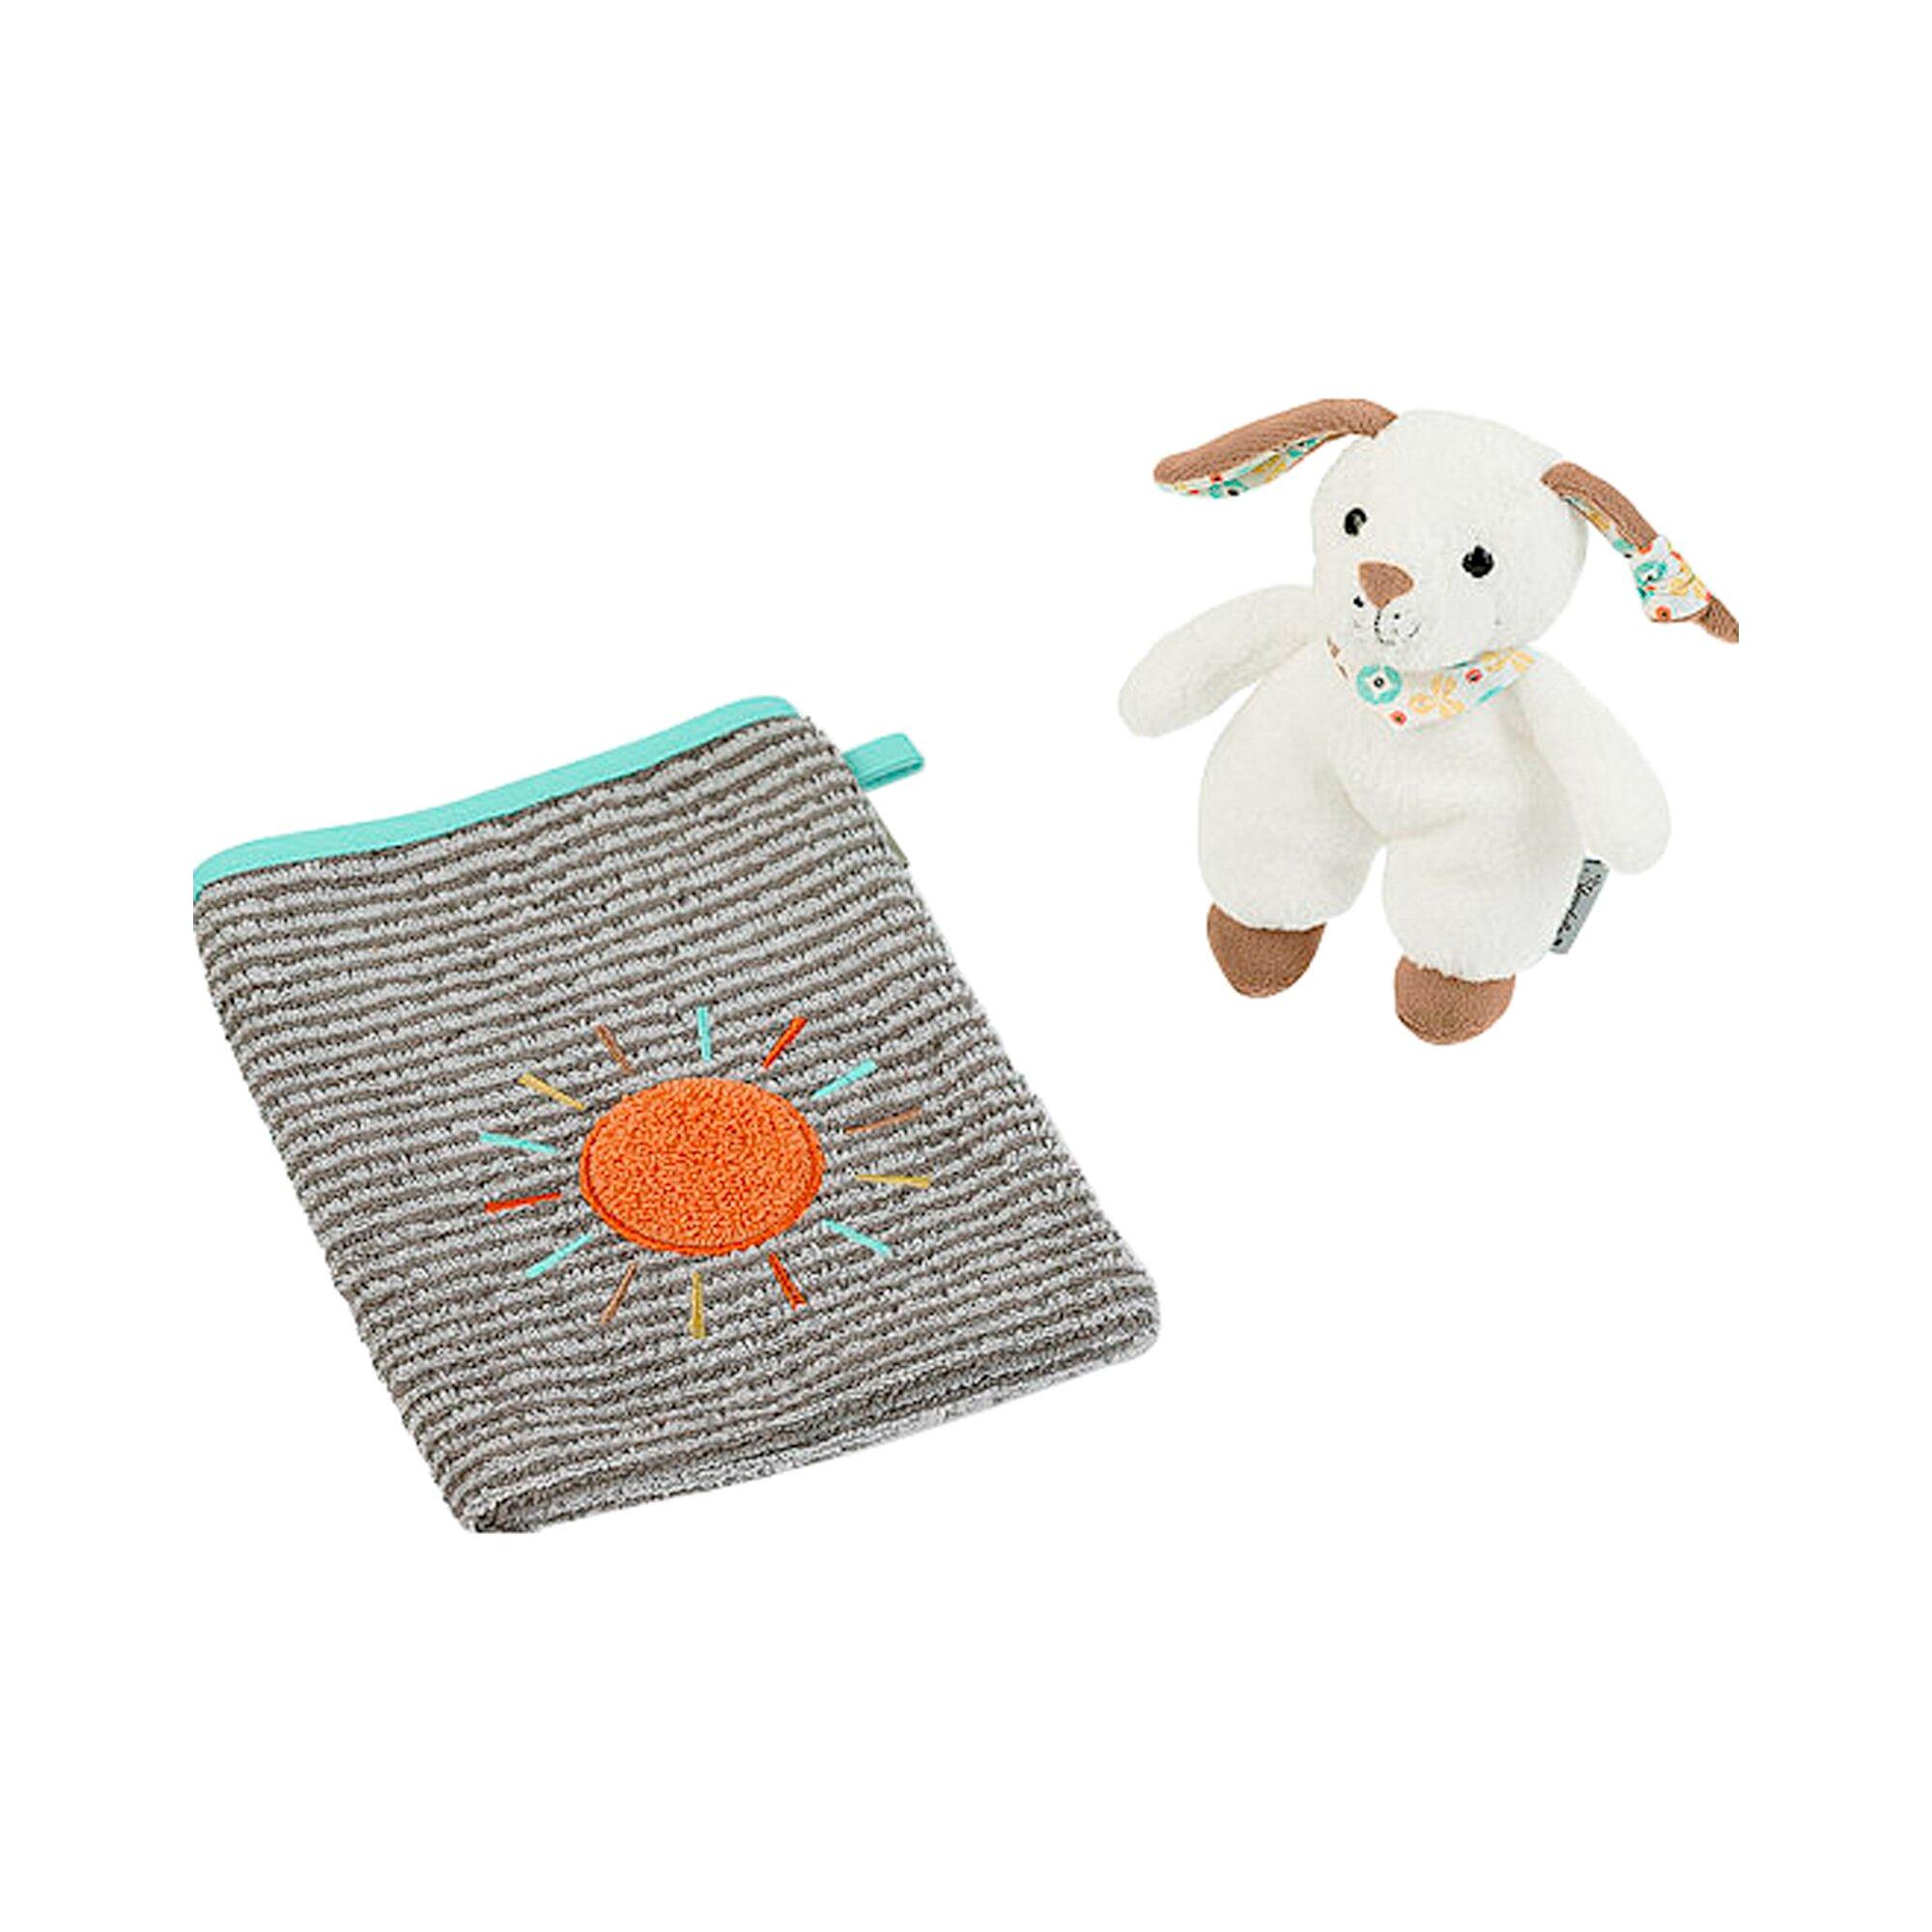 waldis-geschenk-set-hase-hoppel